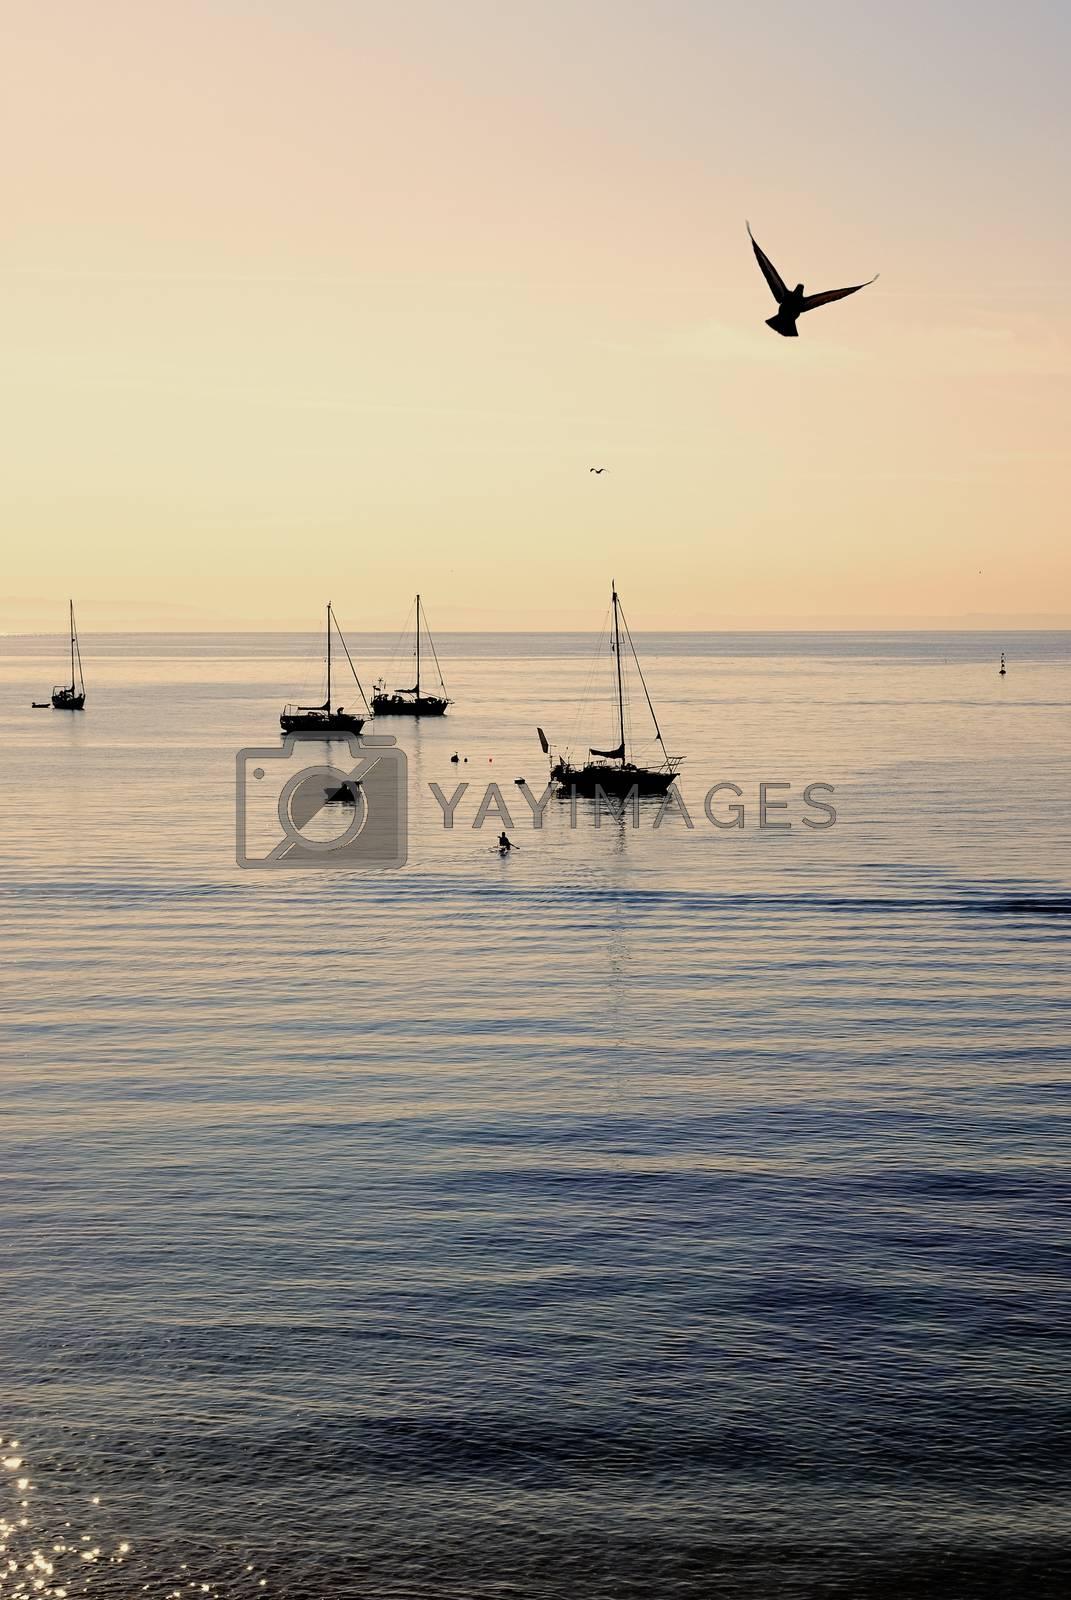 Sailboat against a beautiful sunset